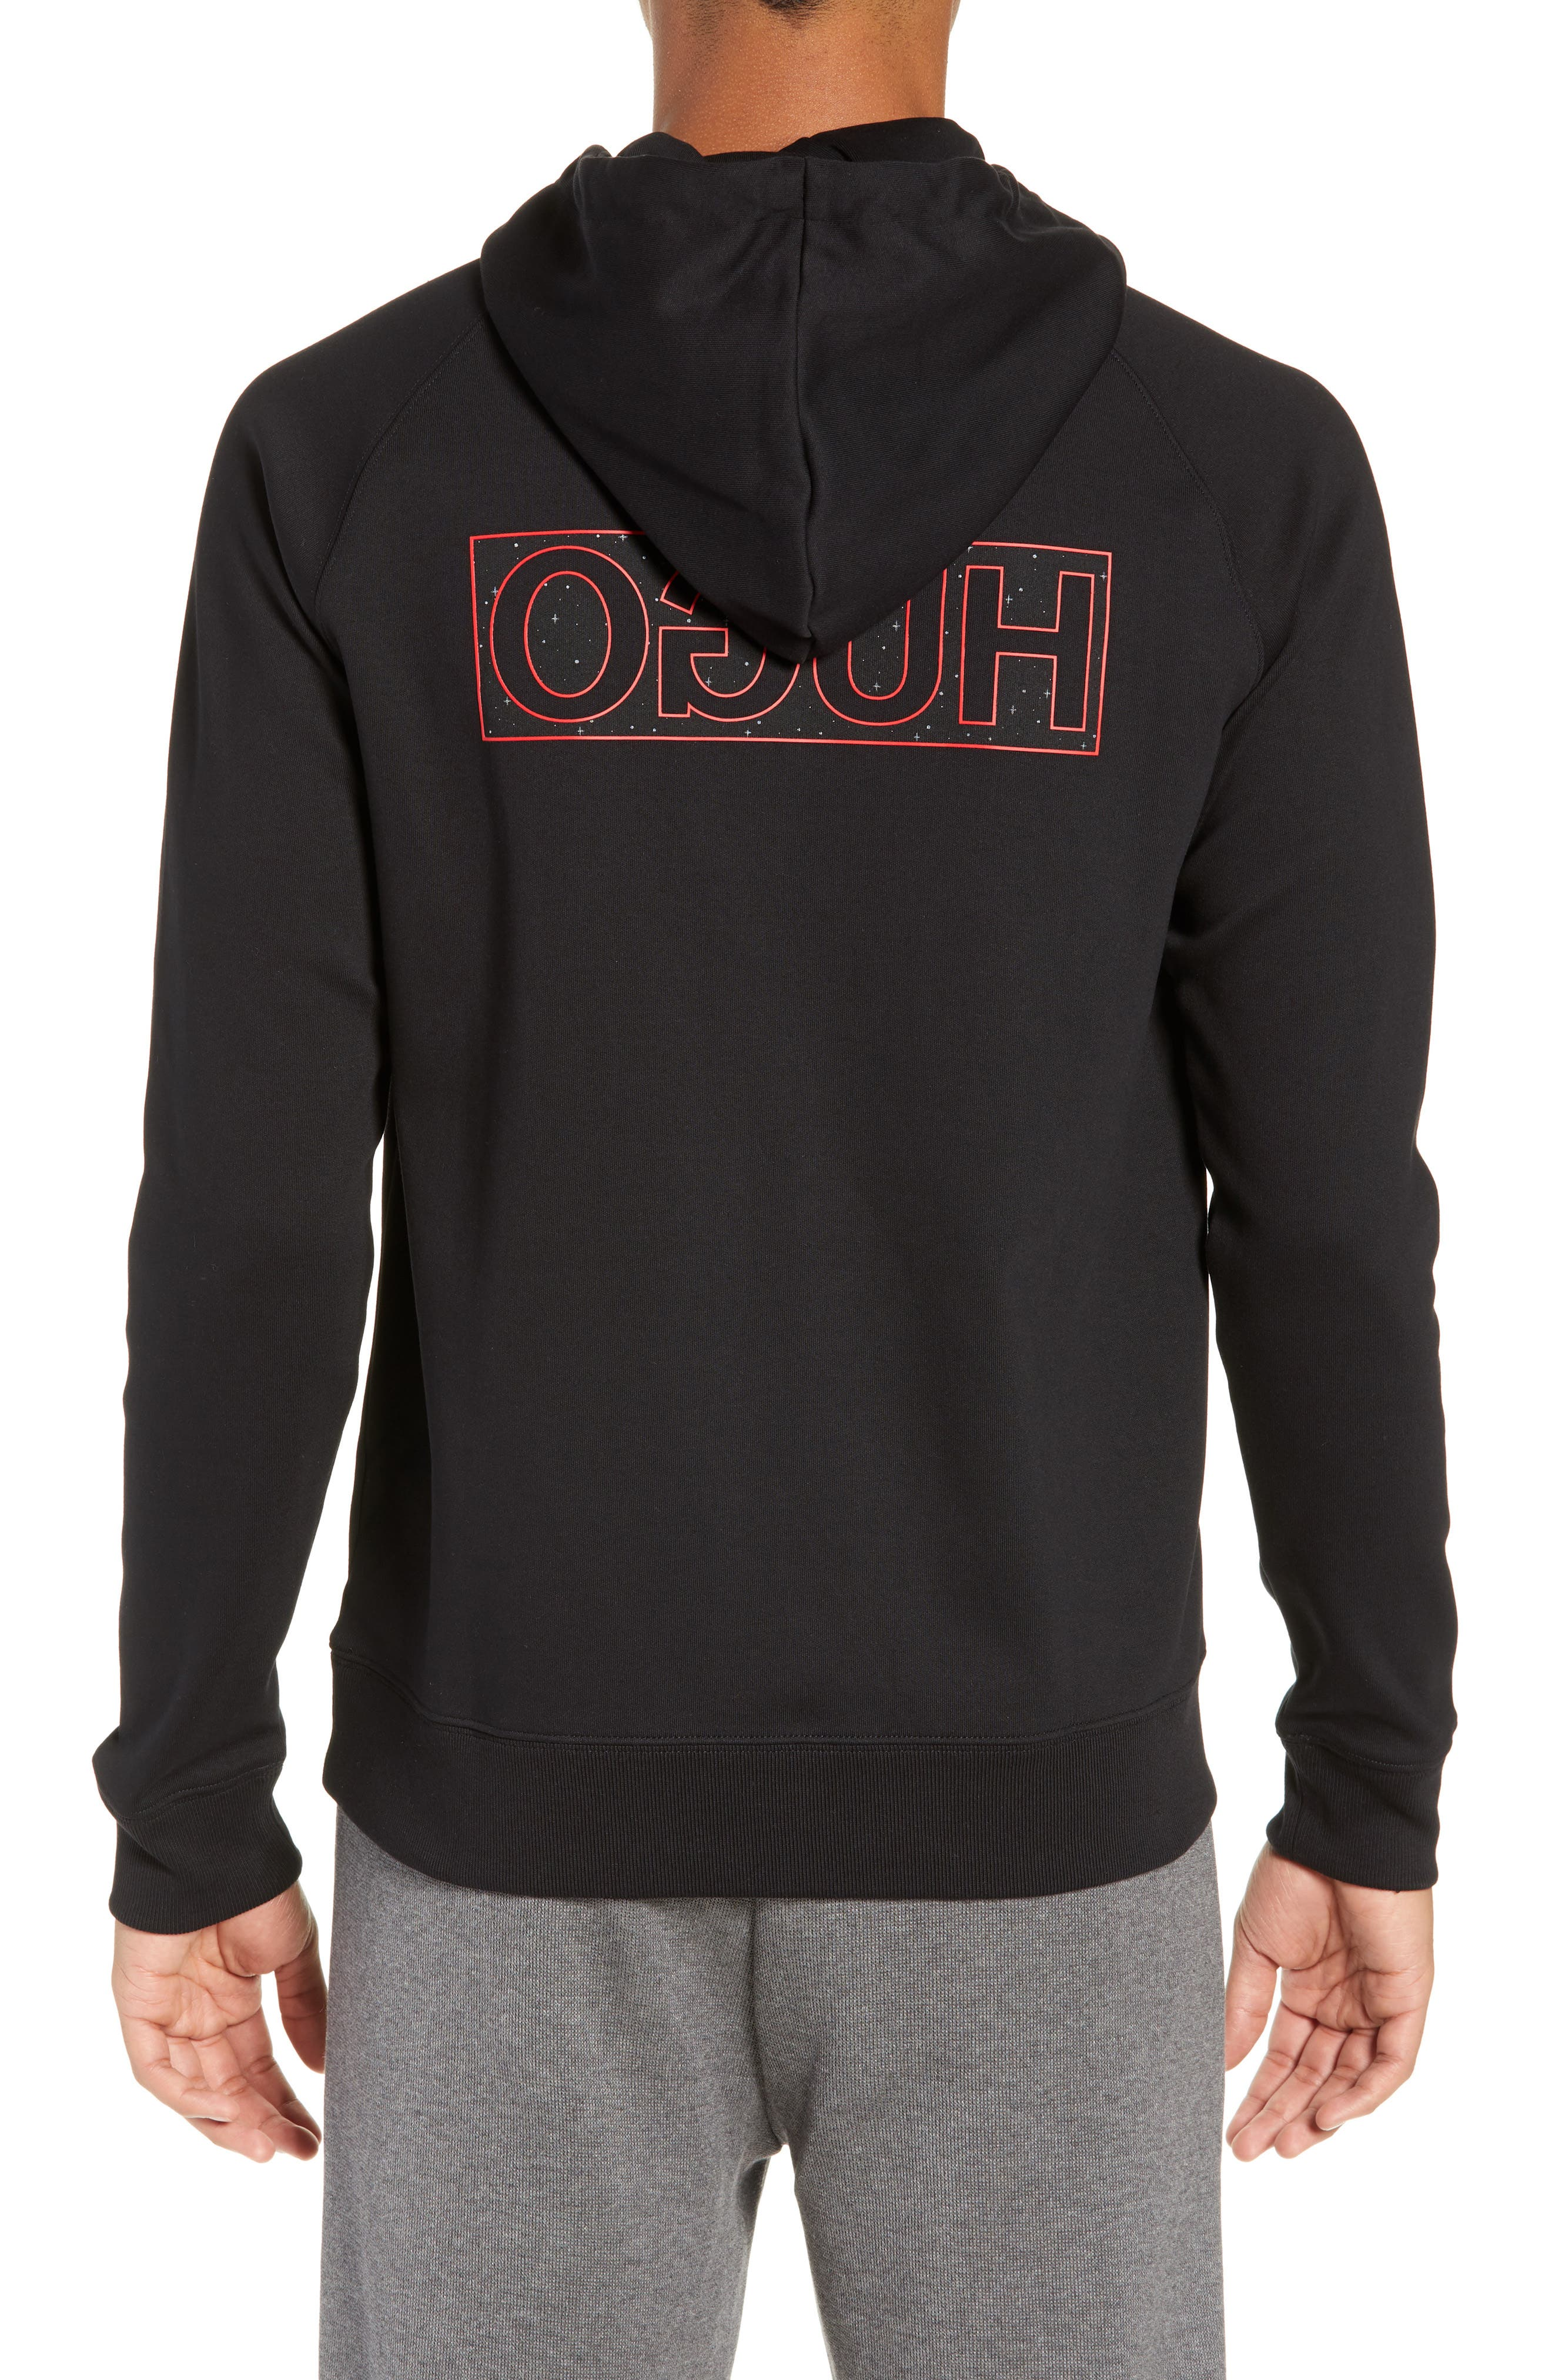 Darti Hoodie Sweatshirt,                             Alternate thumbnail 2, color,                             001